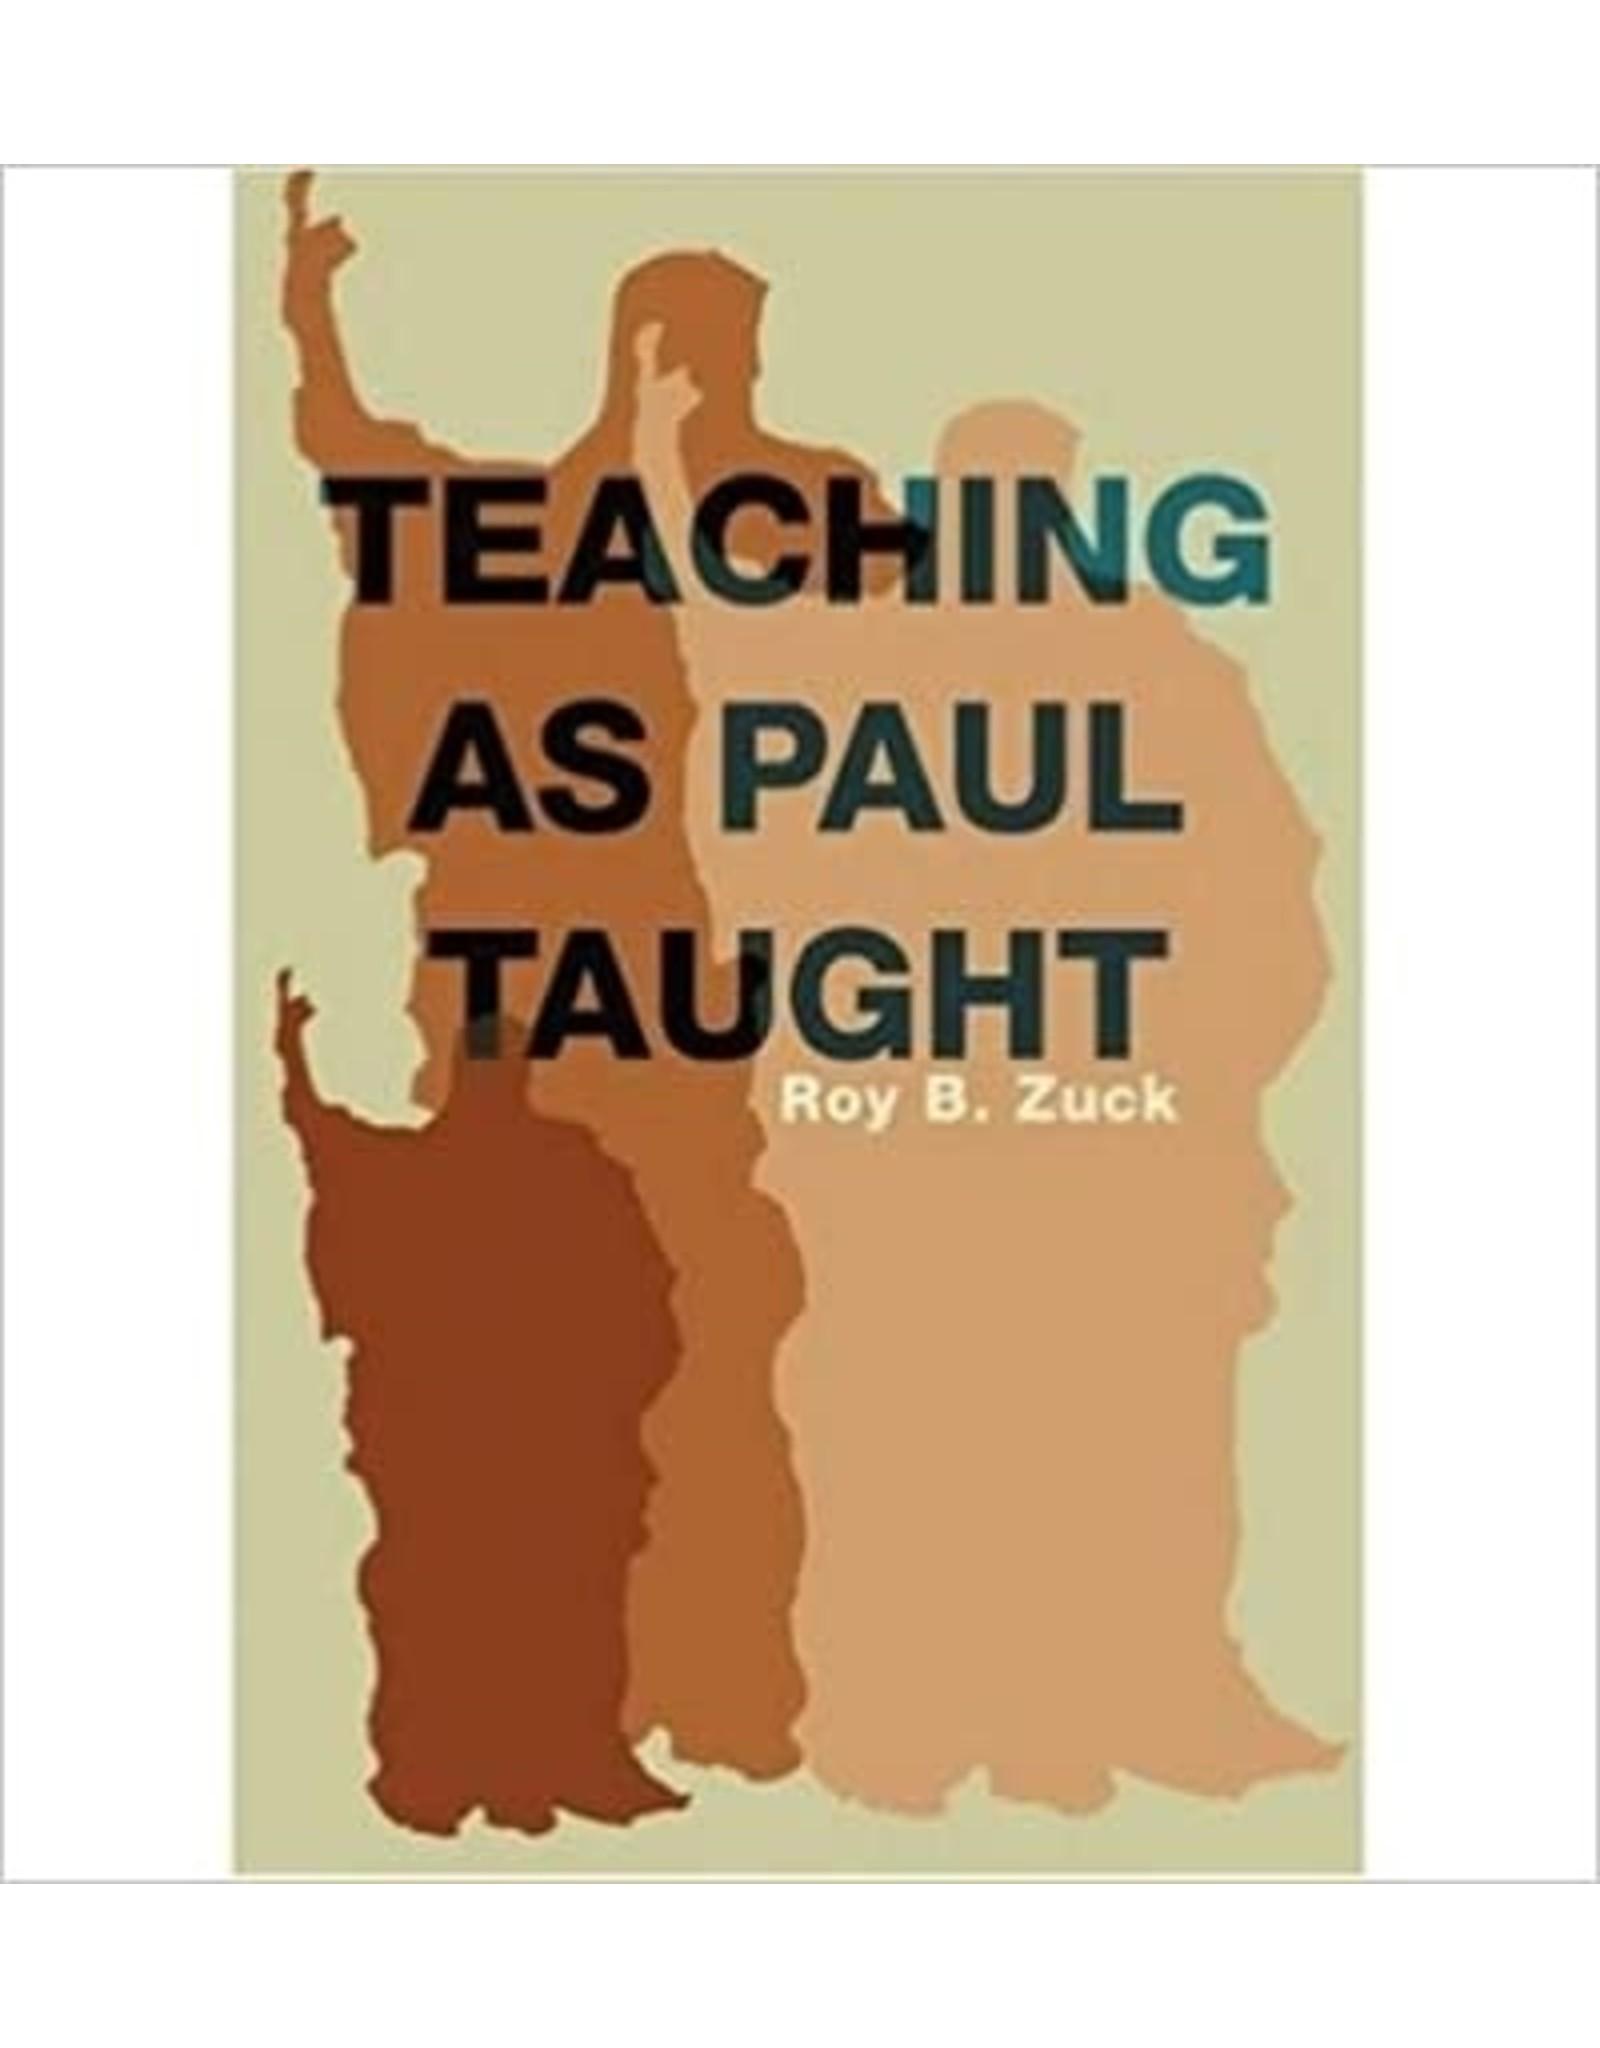 Zuck Teaching as Paul Taught